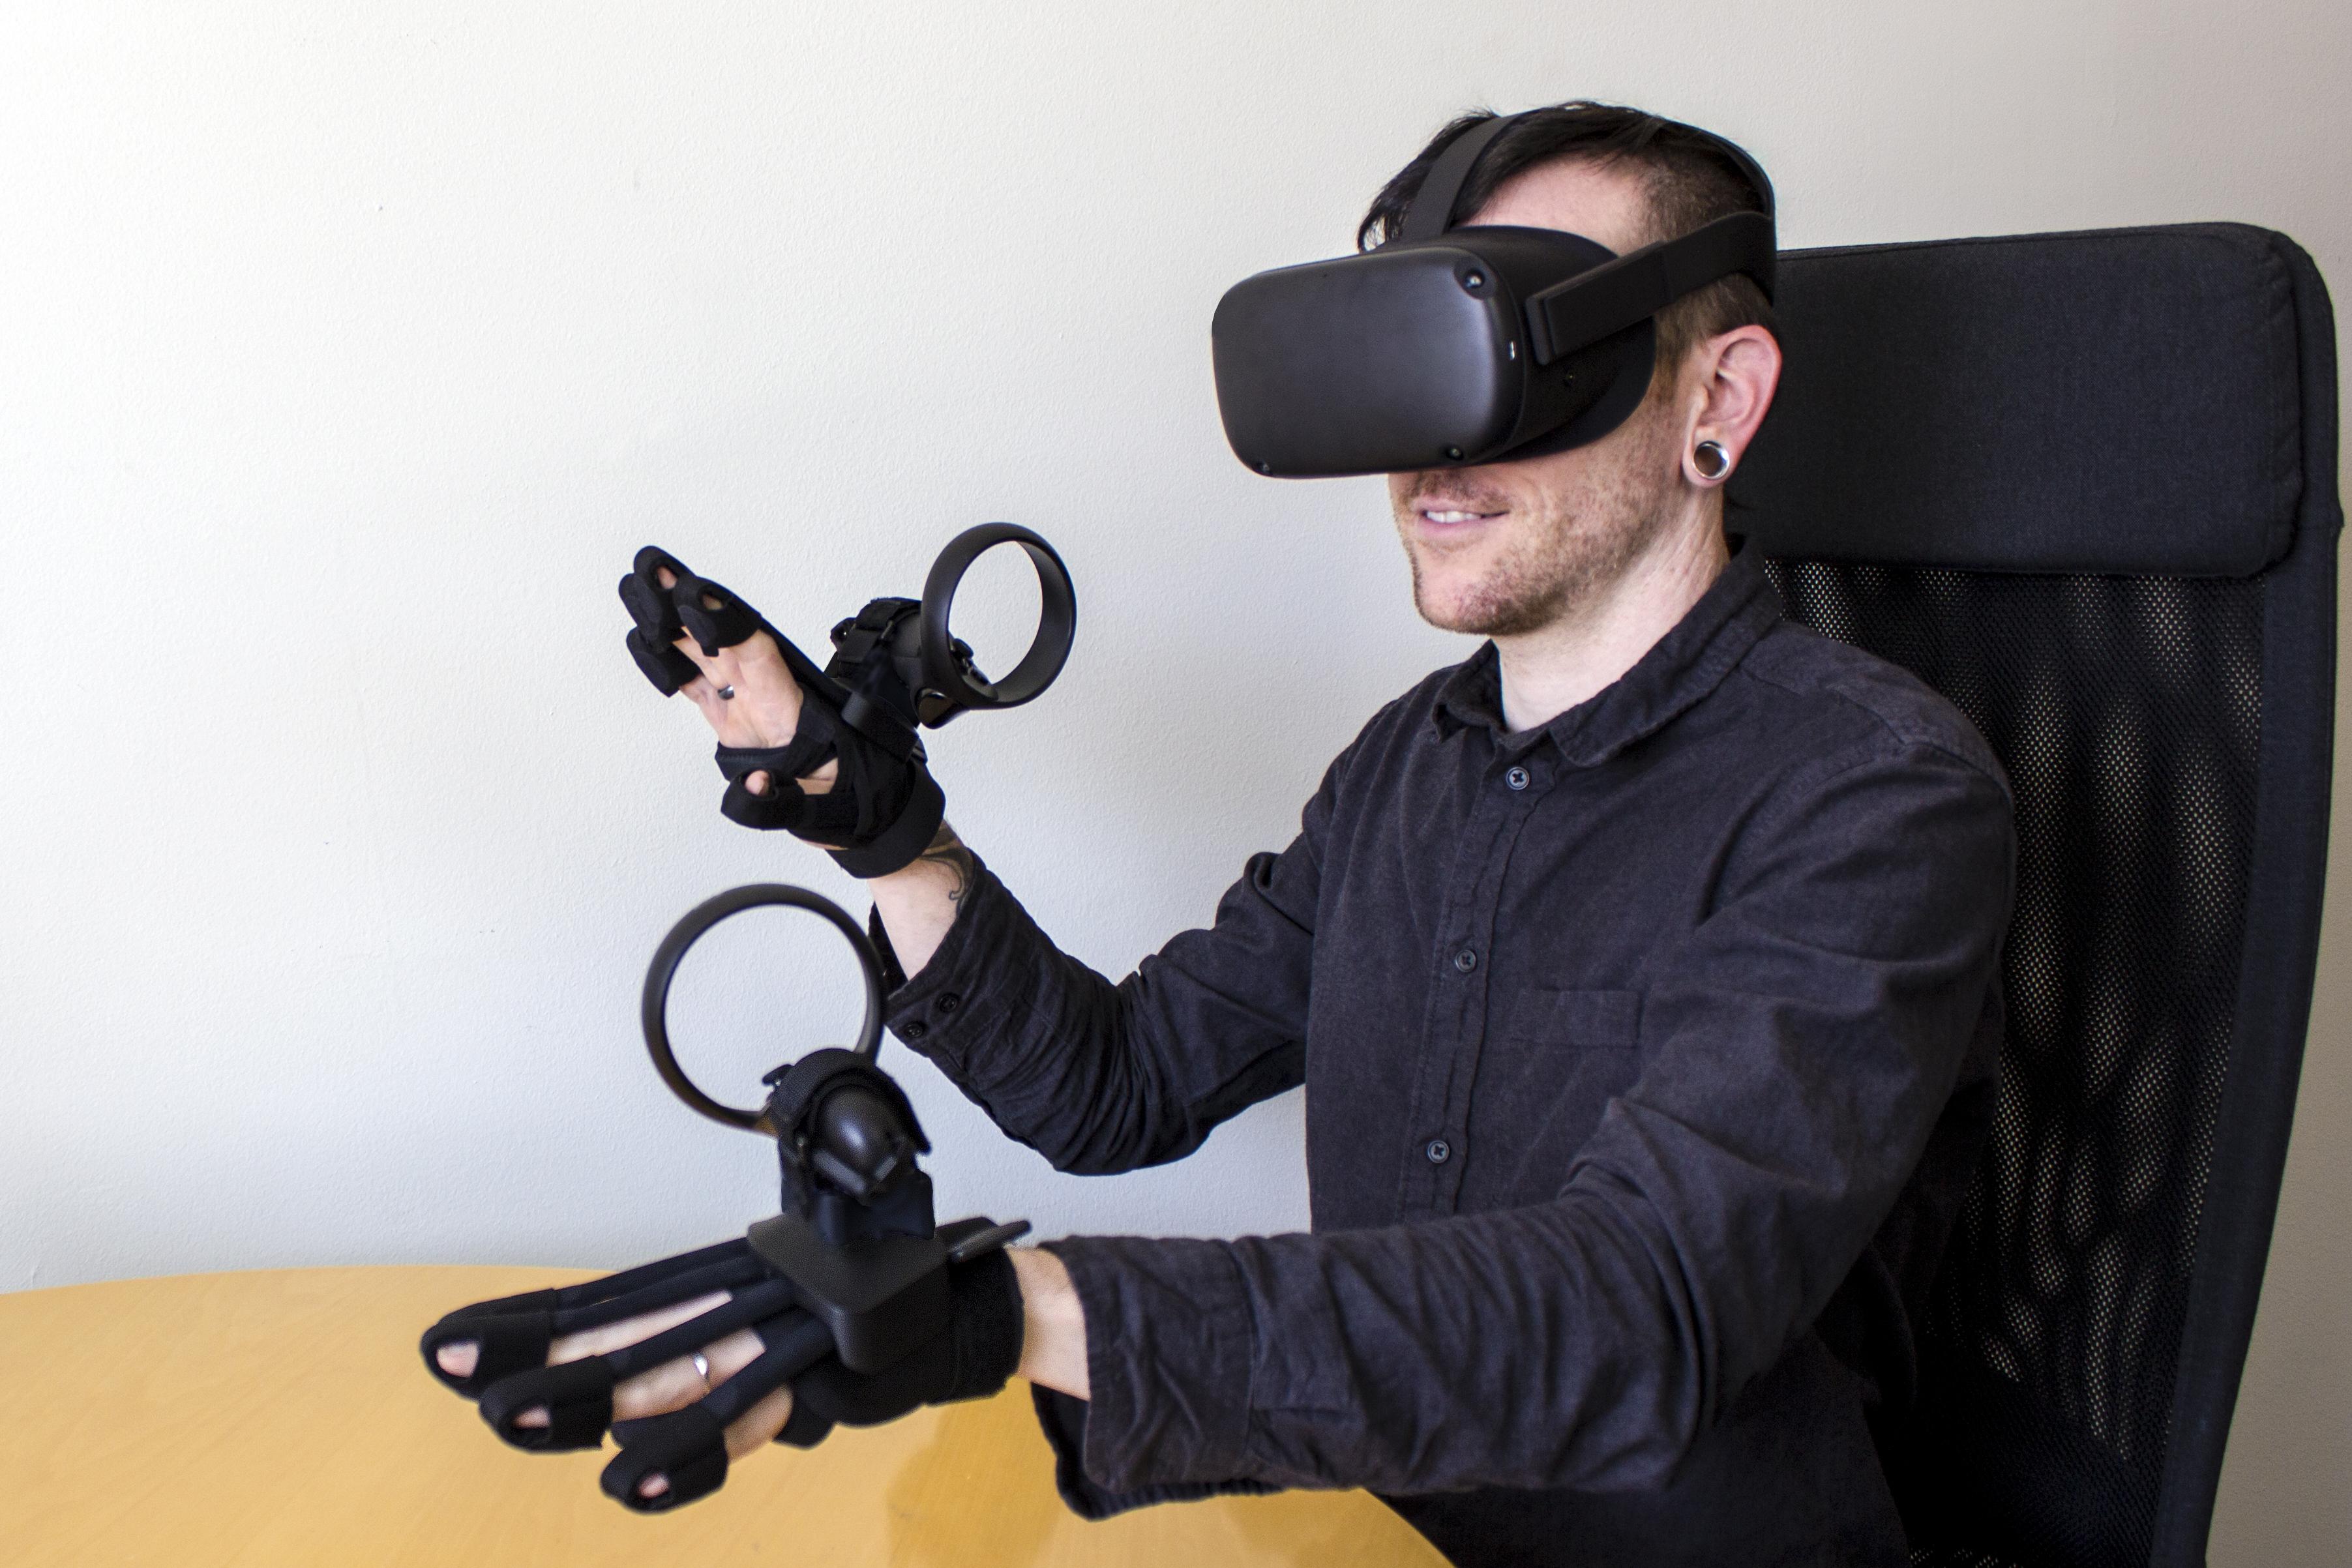 Gants Forte Data Gloves avec Occulus Quest